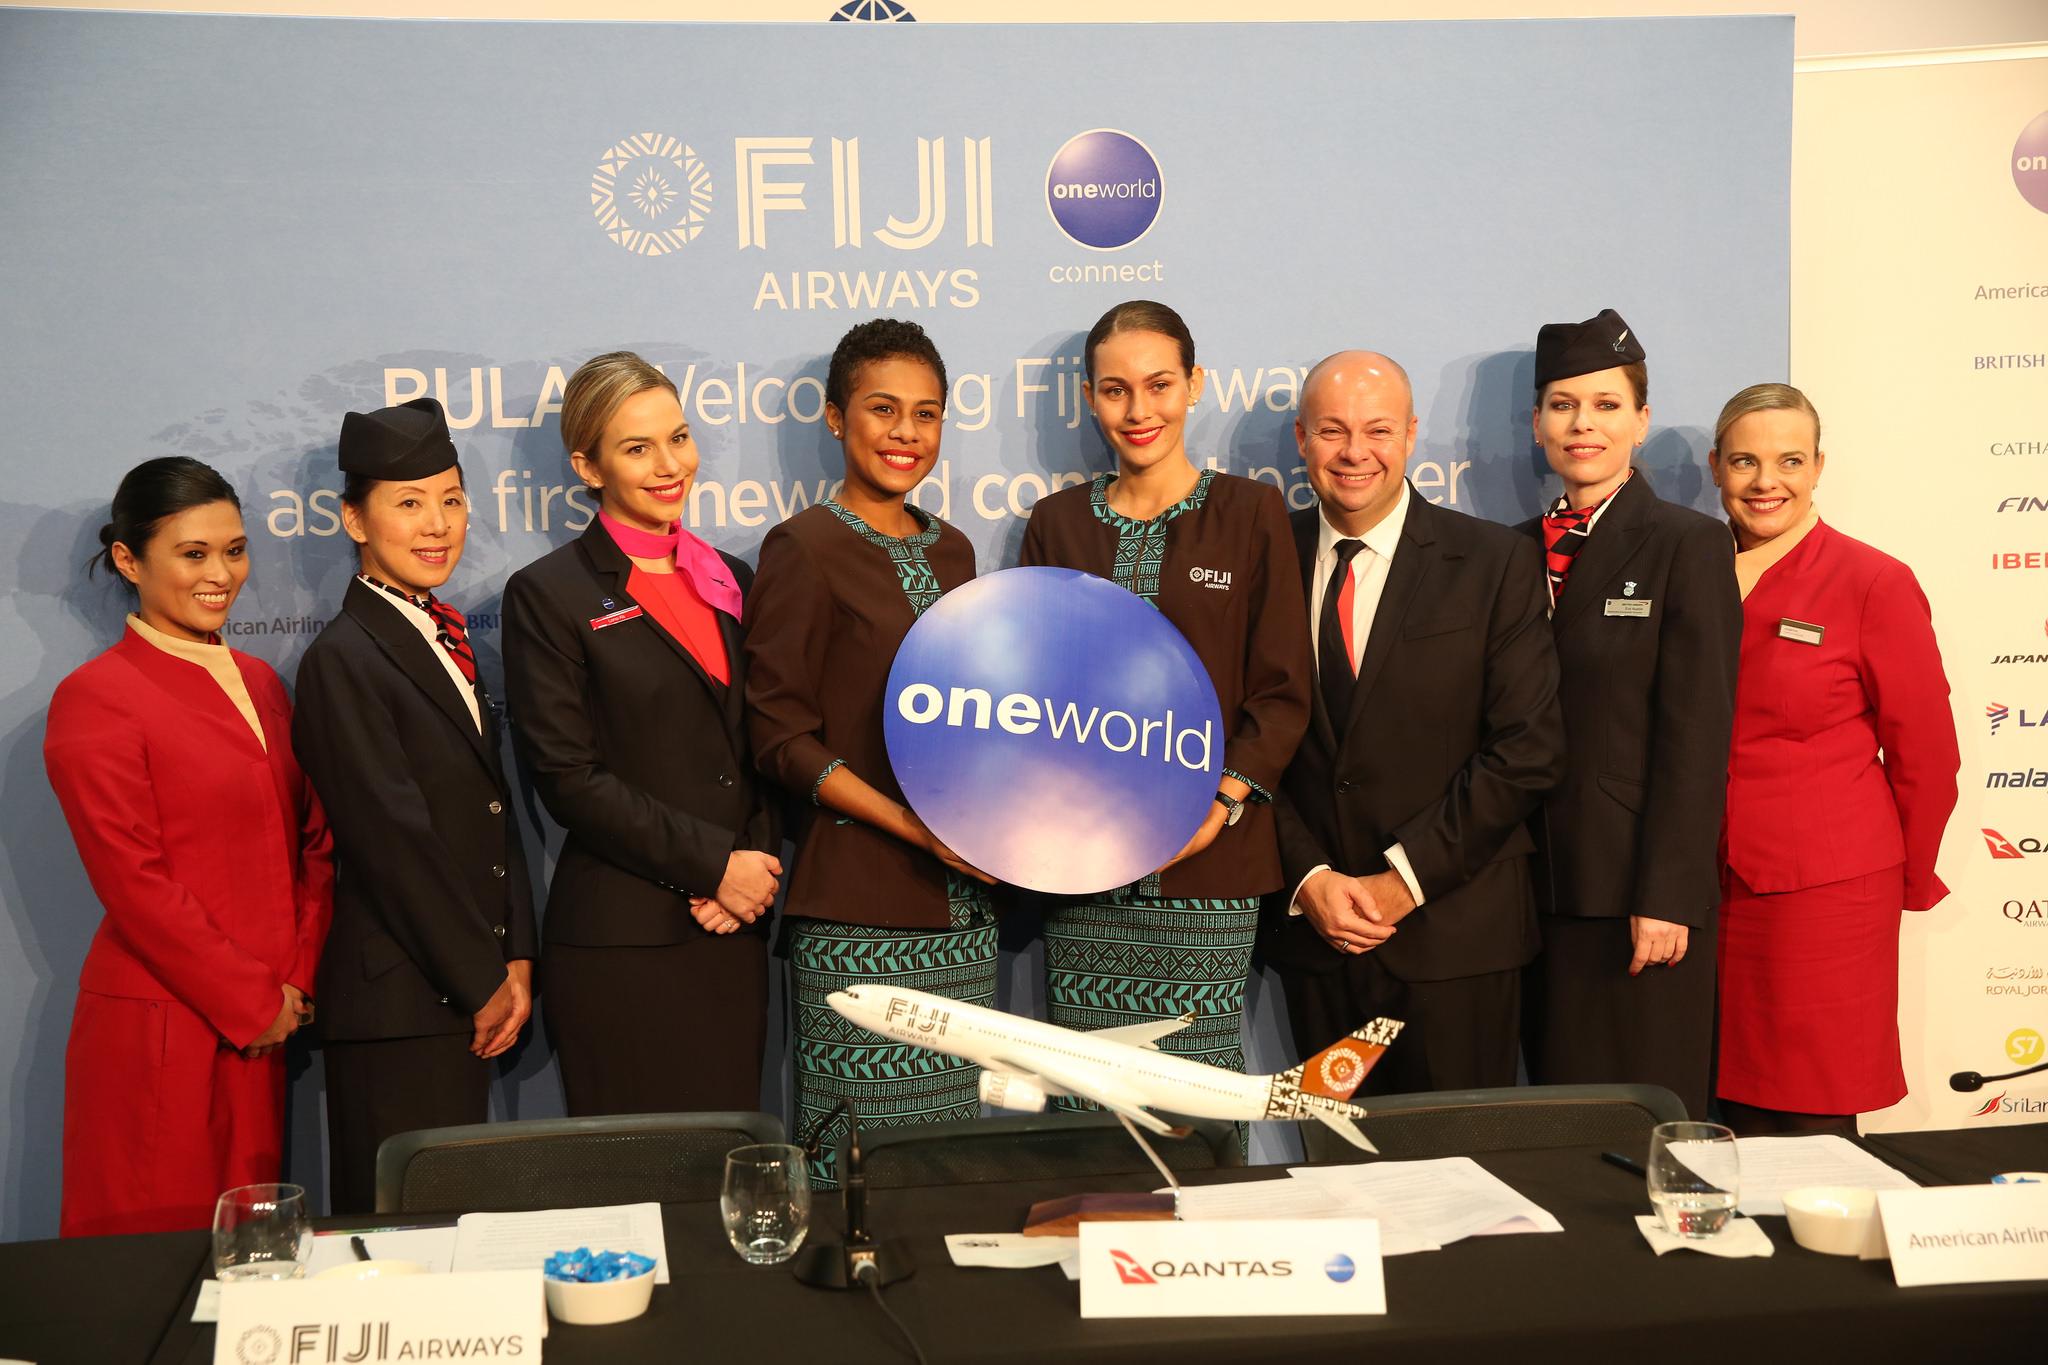 Oneworld introduce plataforma para atraer más aerolíneas